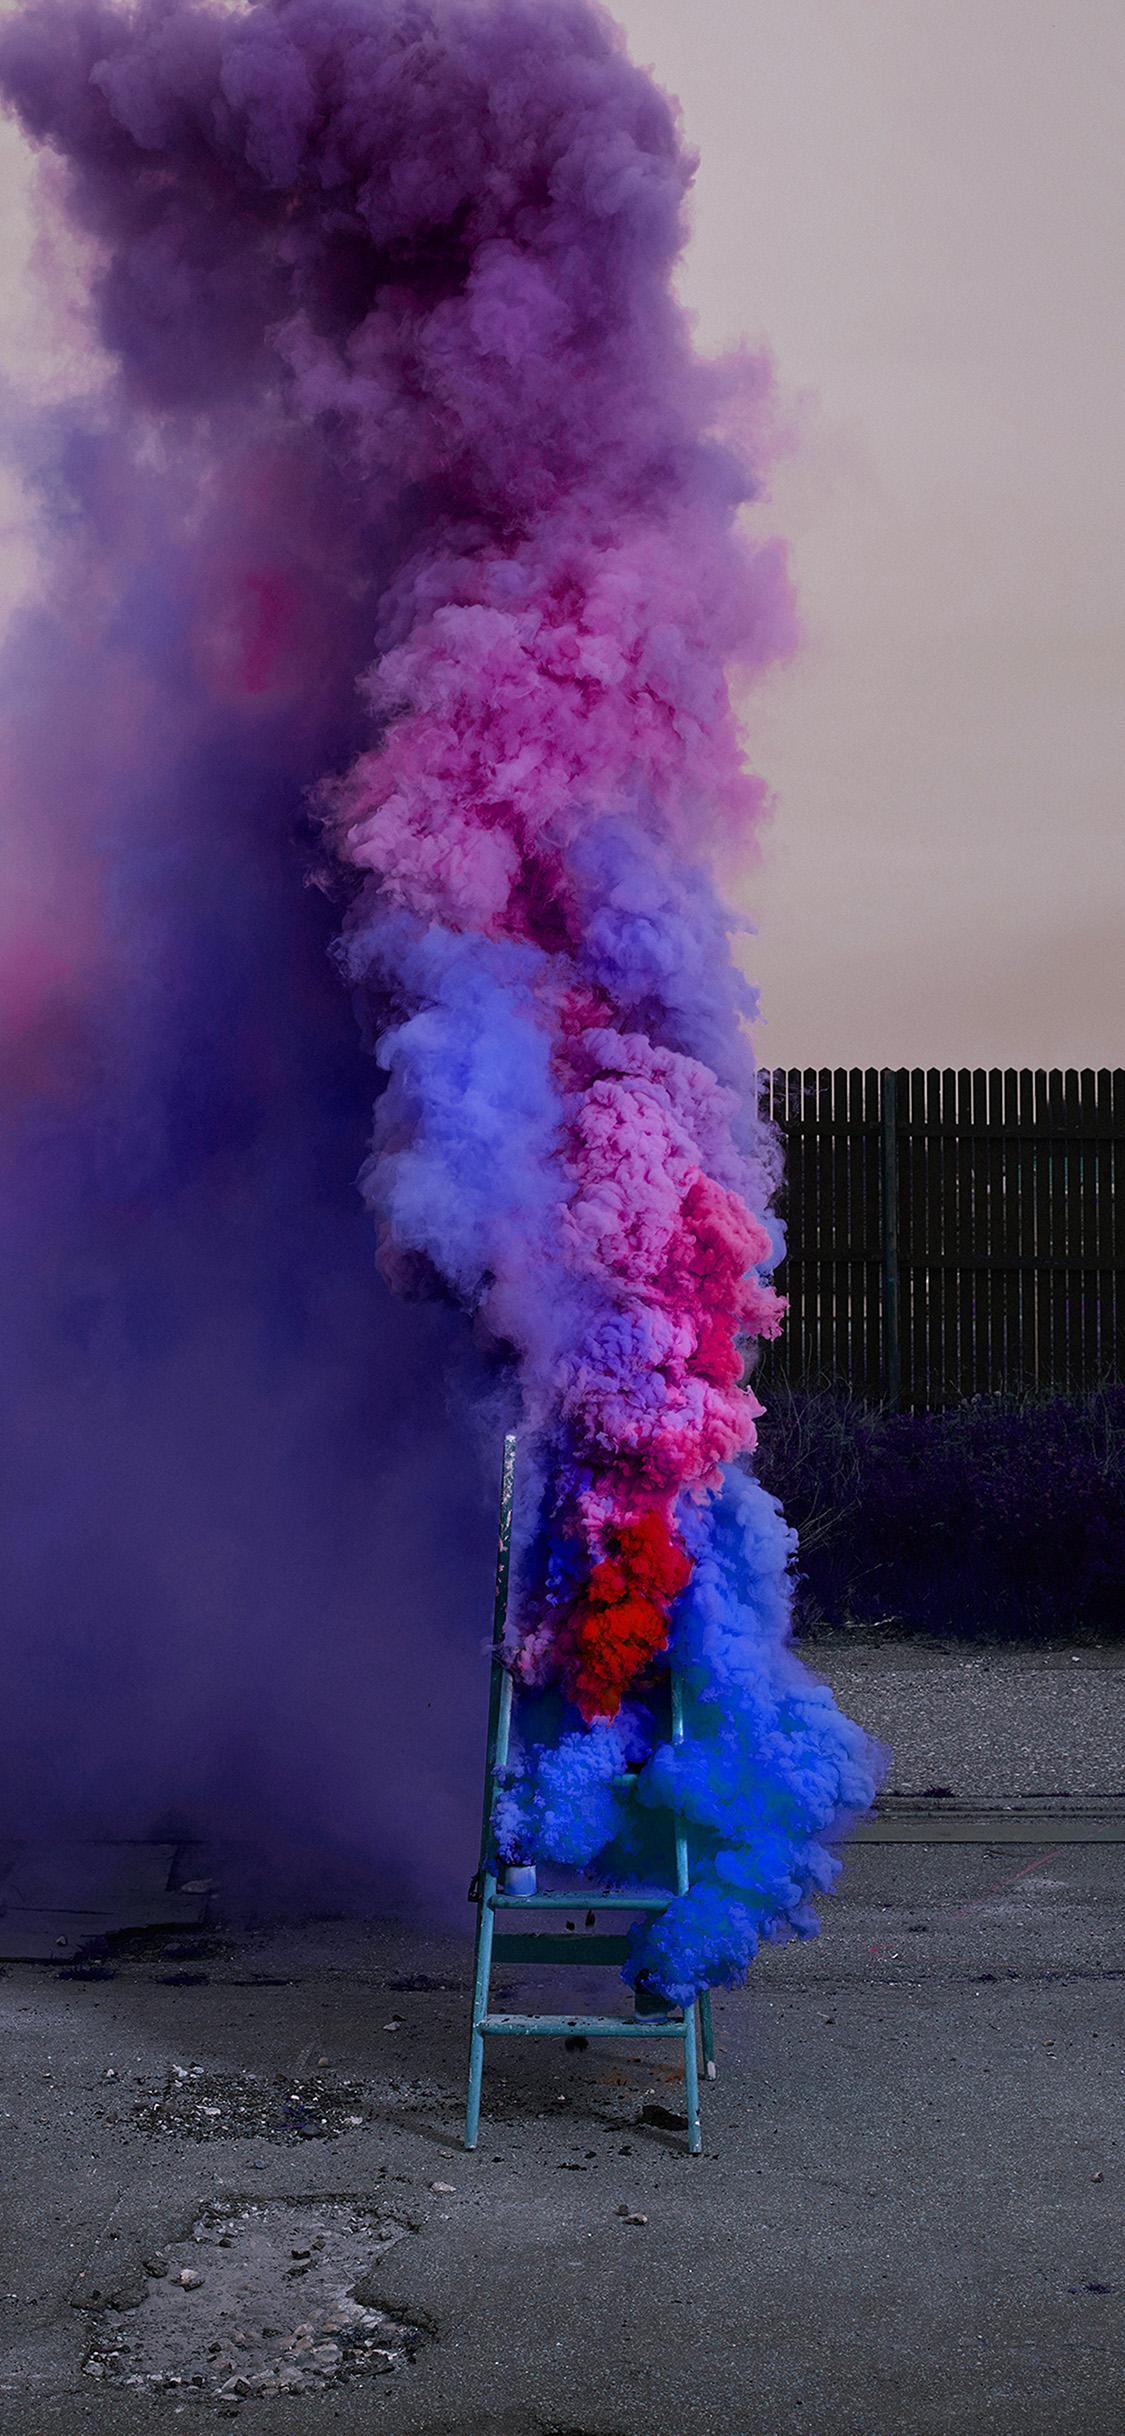 Iphonexpapers Com Iphone X Wallpaper Bi04 Fire Smoke Purple Art